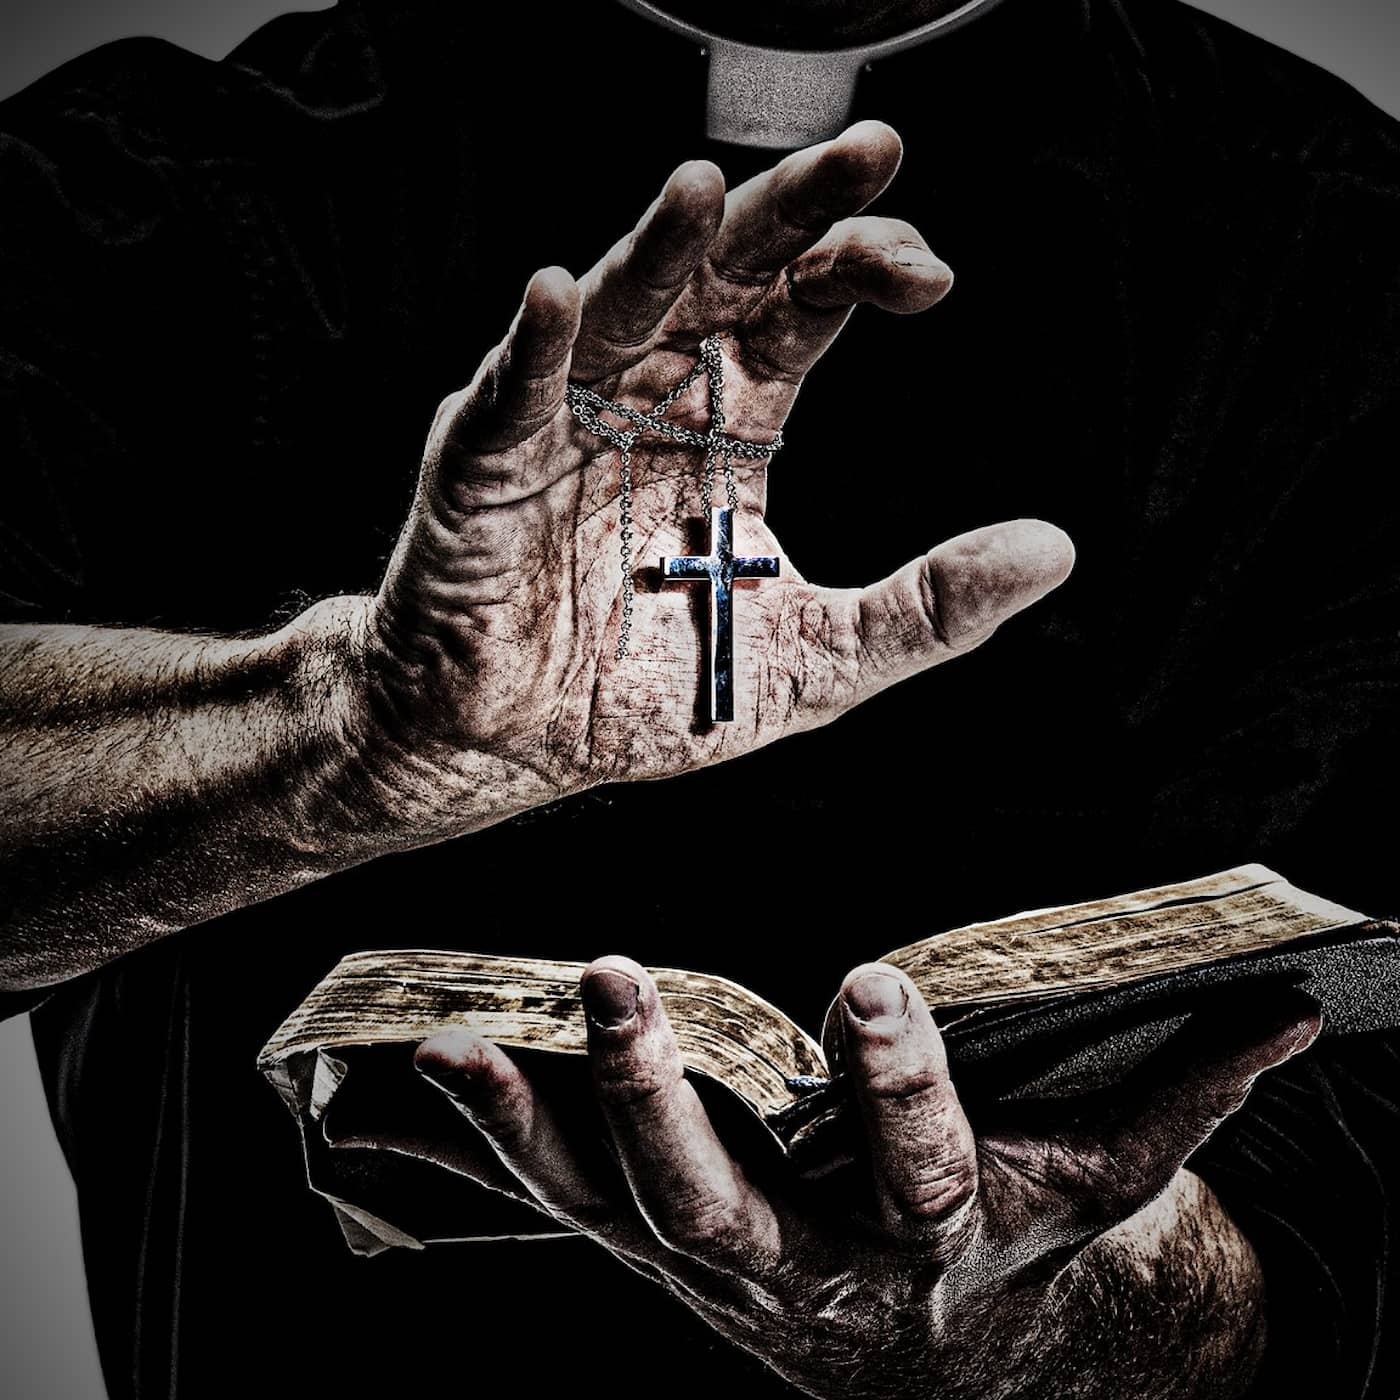 BONUSKLIPP: Akutläkarens vittnesmål (Exorcismen i Eksjö)